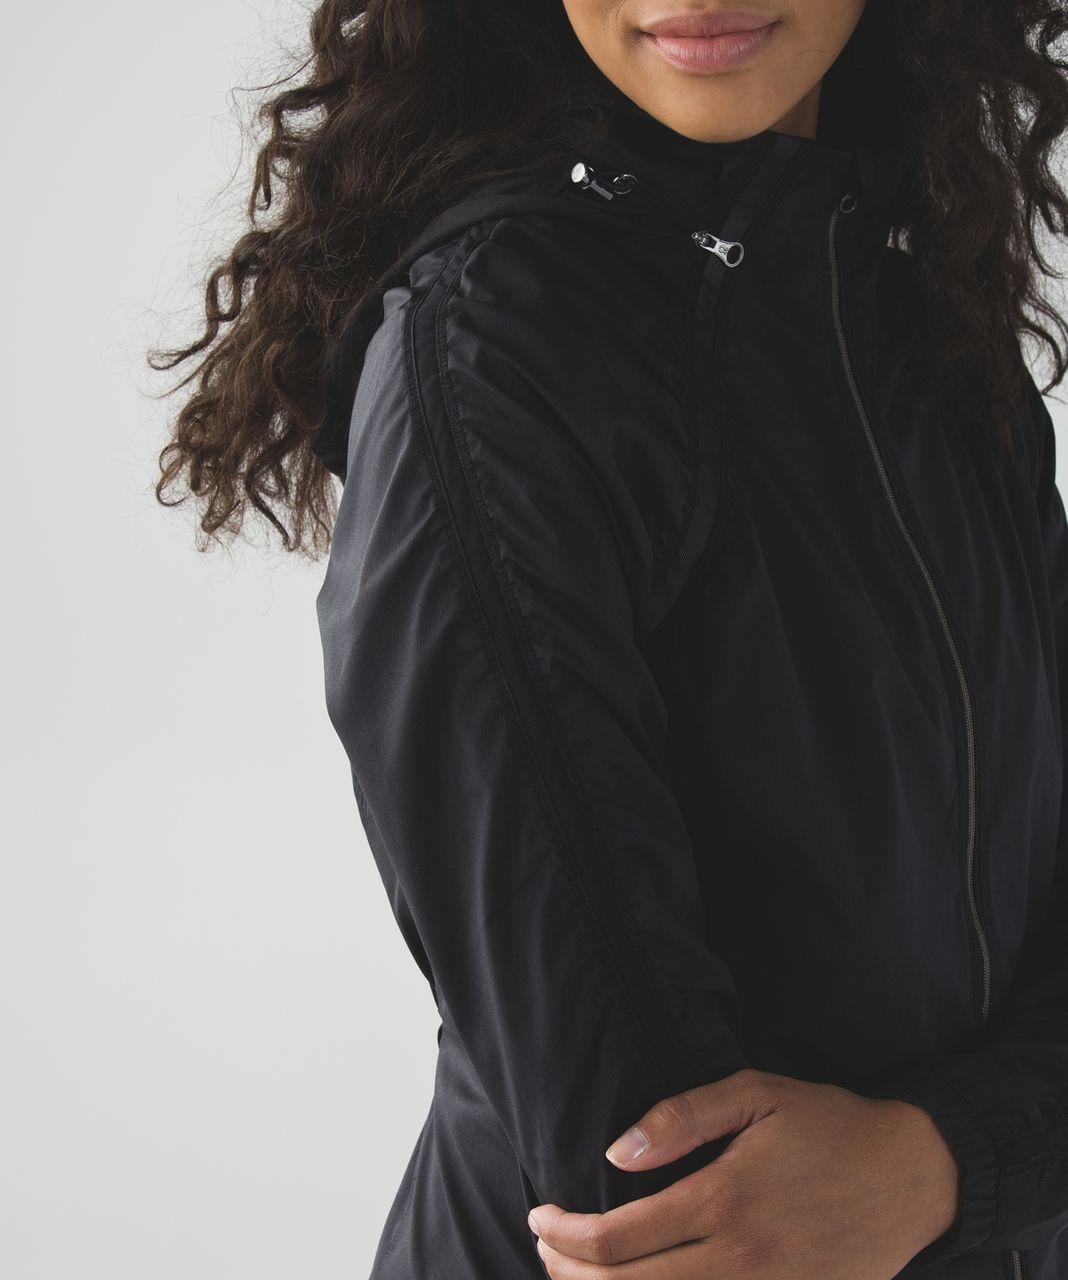 Lululemon Gather And Sprint Jacket - Black